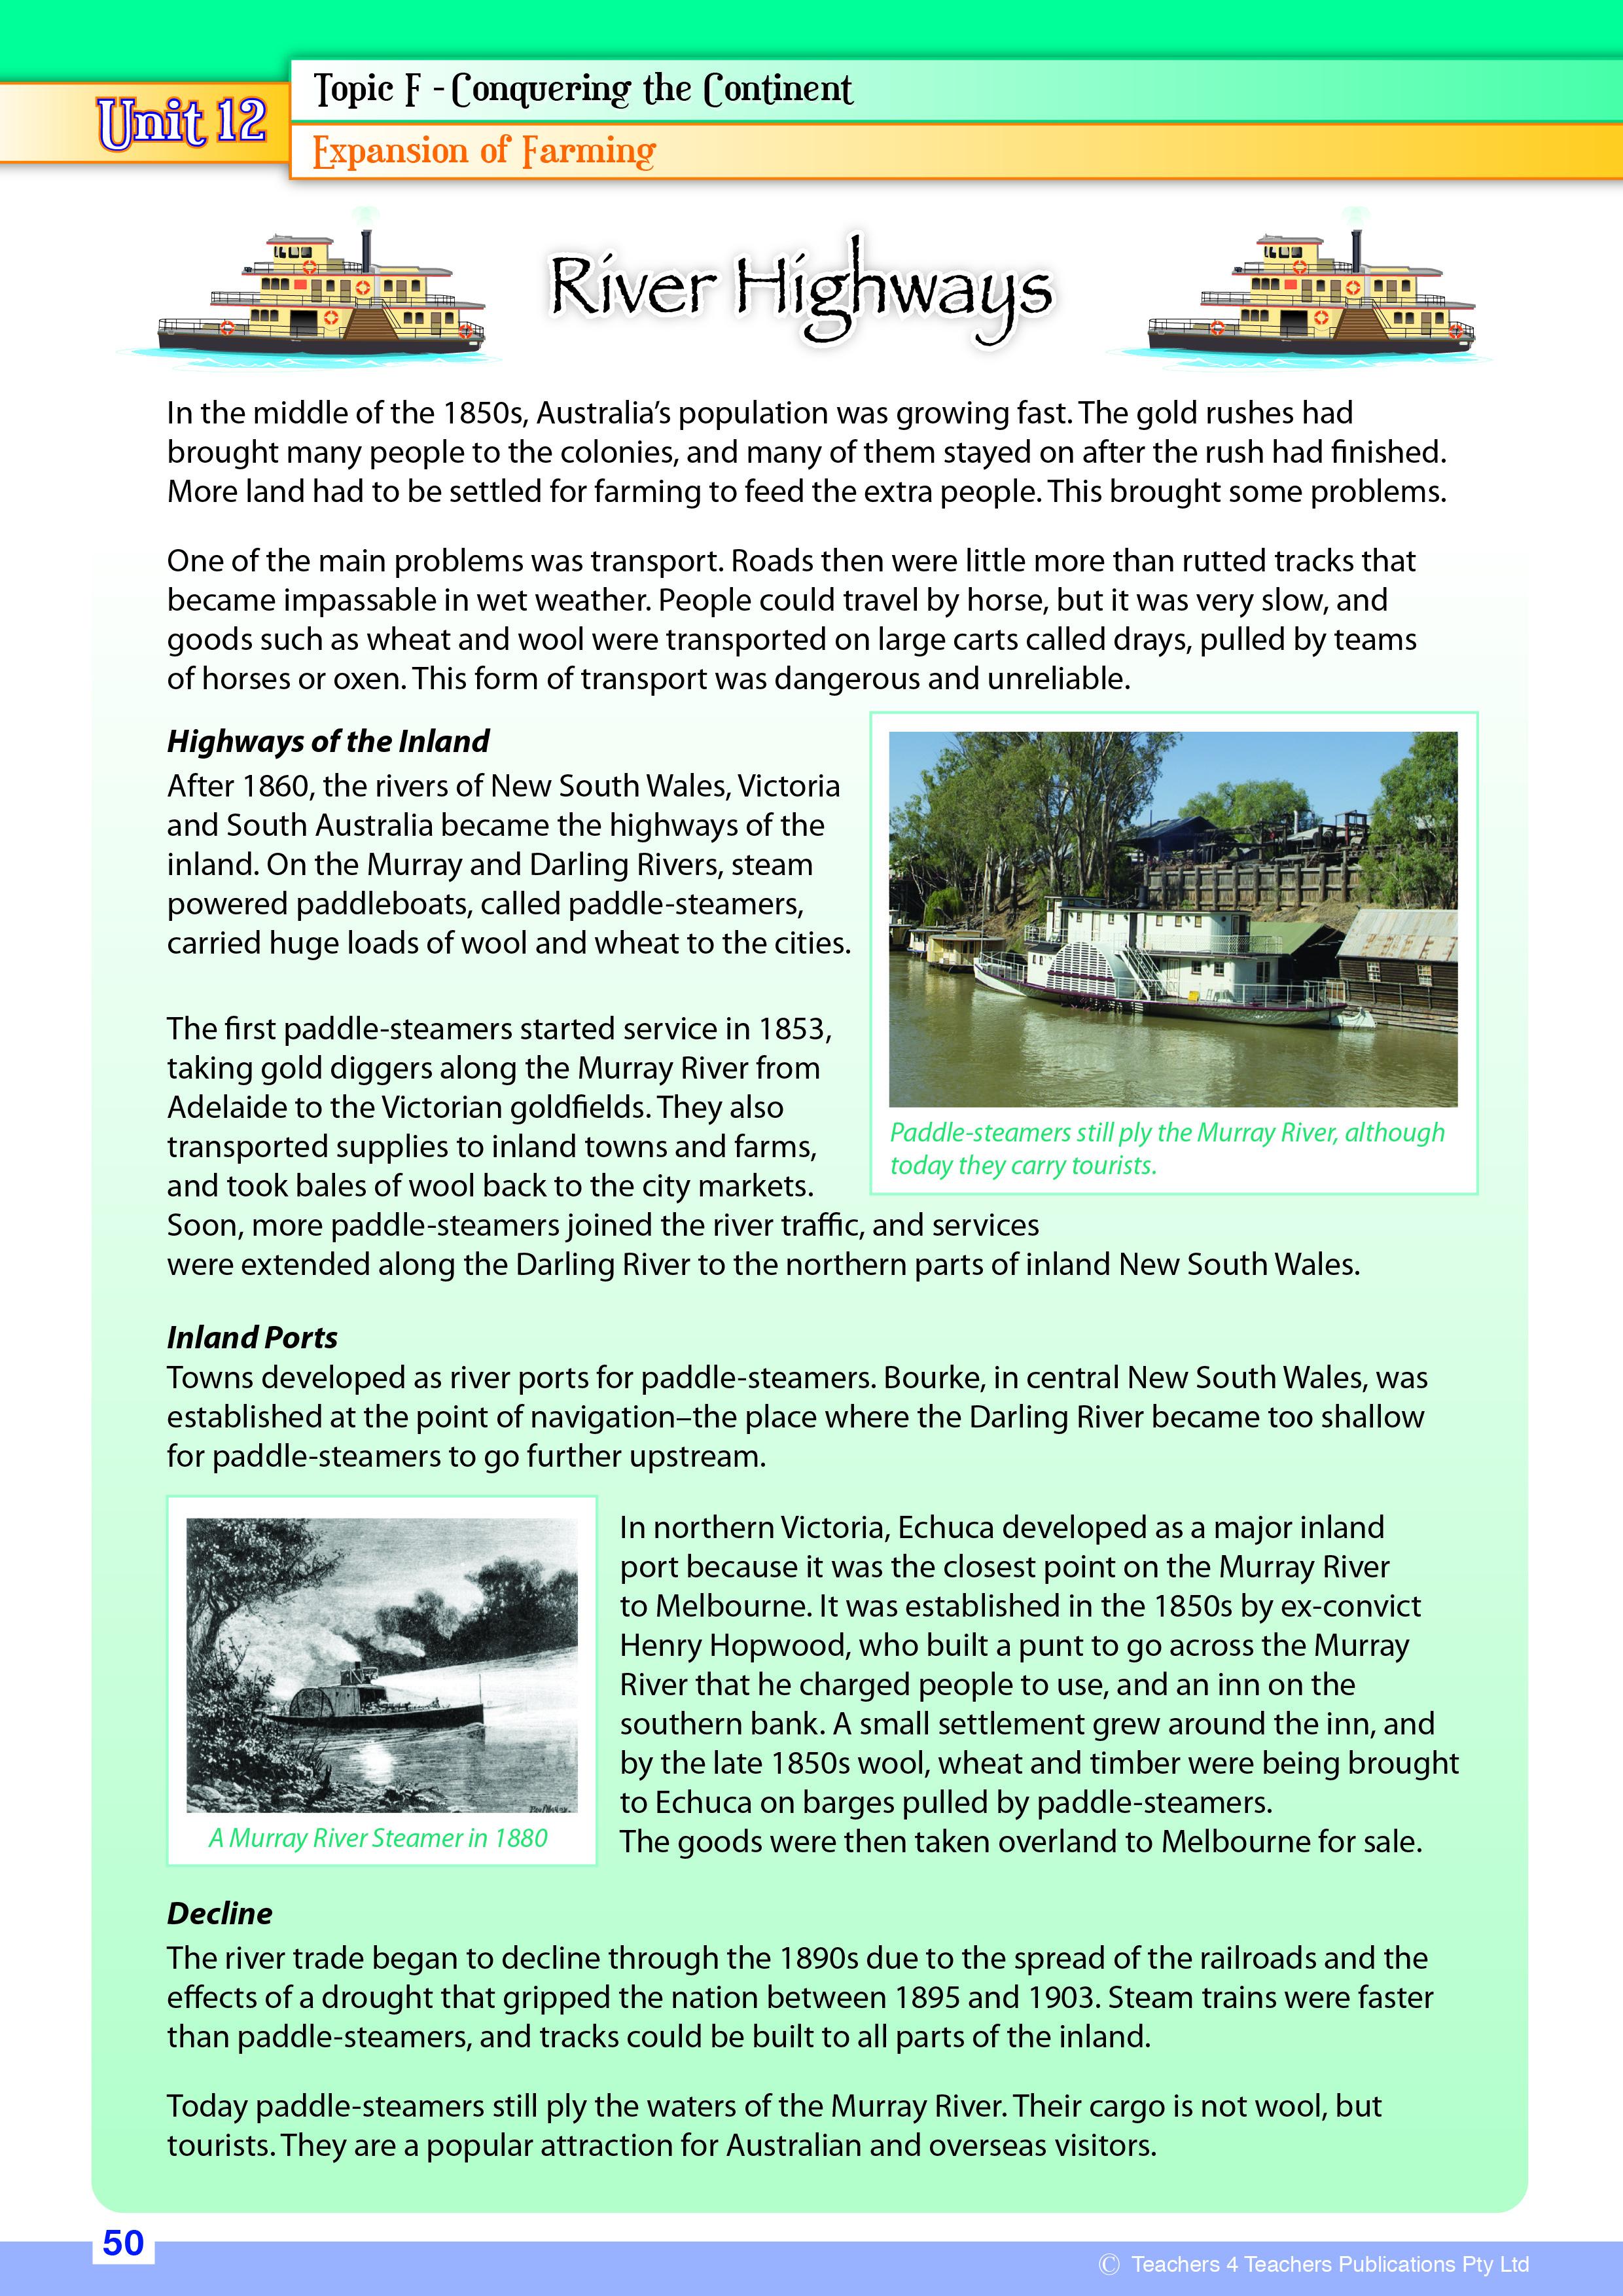 History Now - Teachers 4 Teachers Publications Pty Ltd